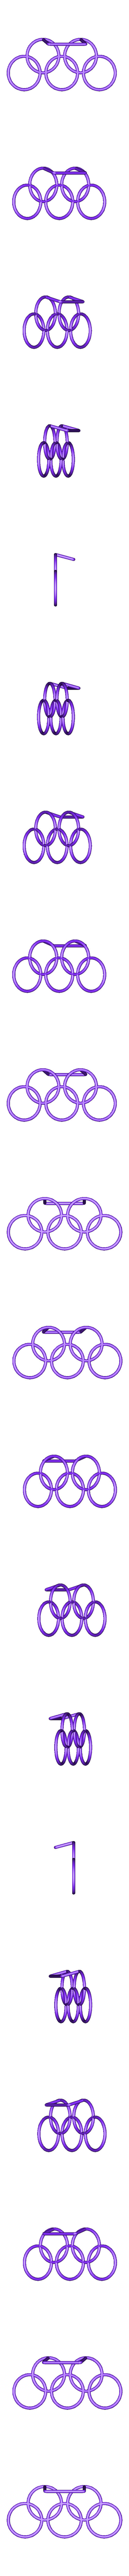 OlympicRings-5-Desk-N.stl Download free STL file Olympic Rings - Desk Plaque • 3D printable design, djgeenen